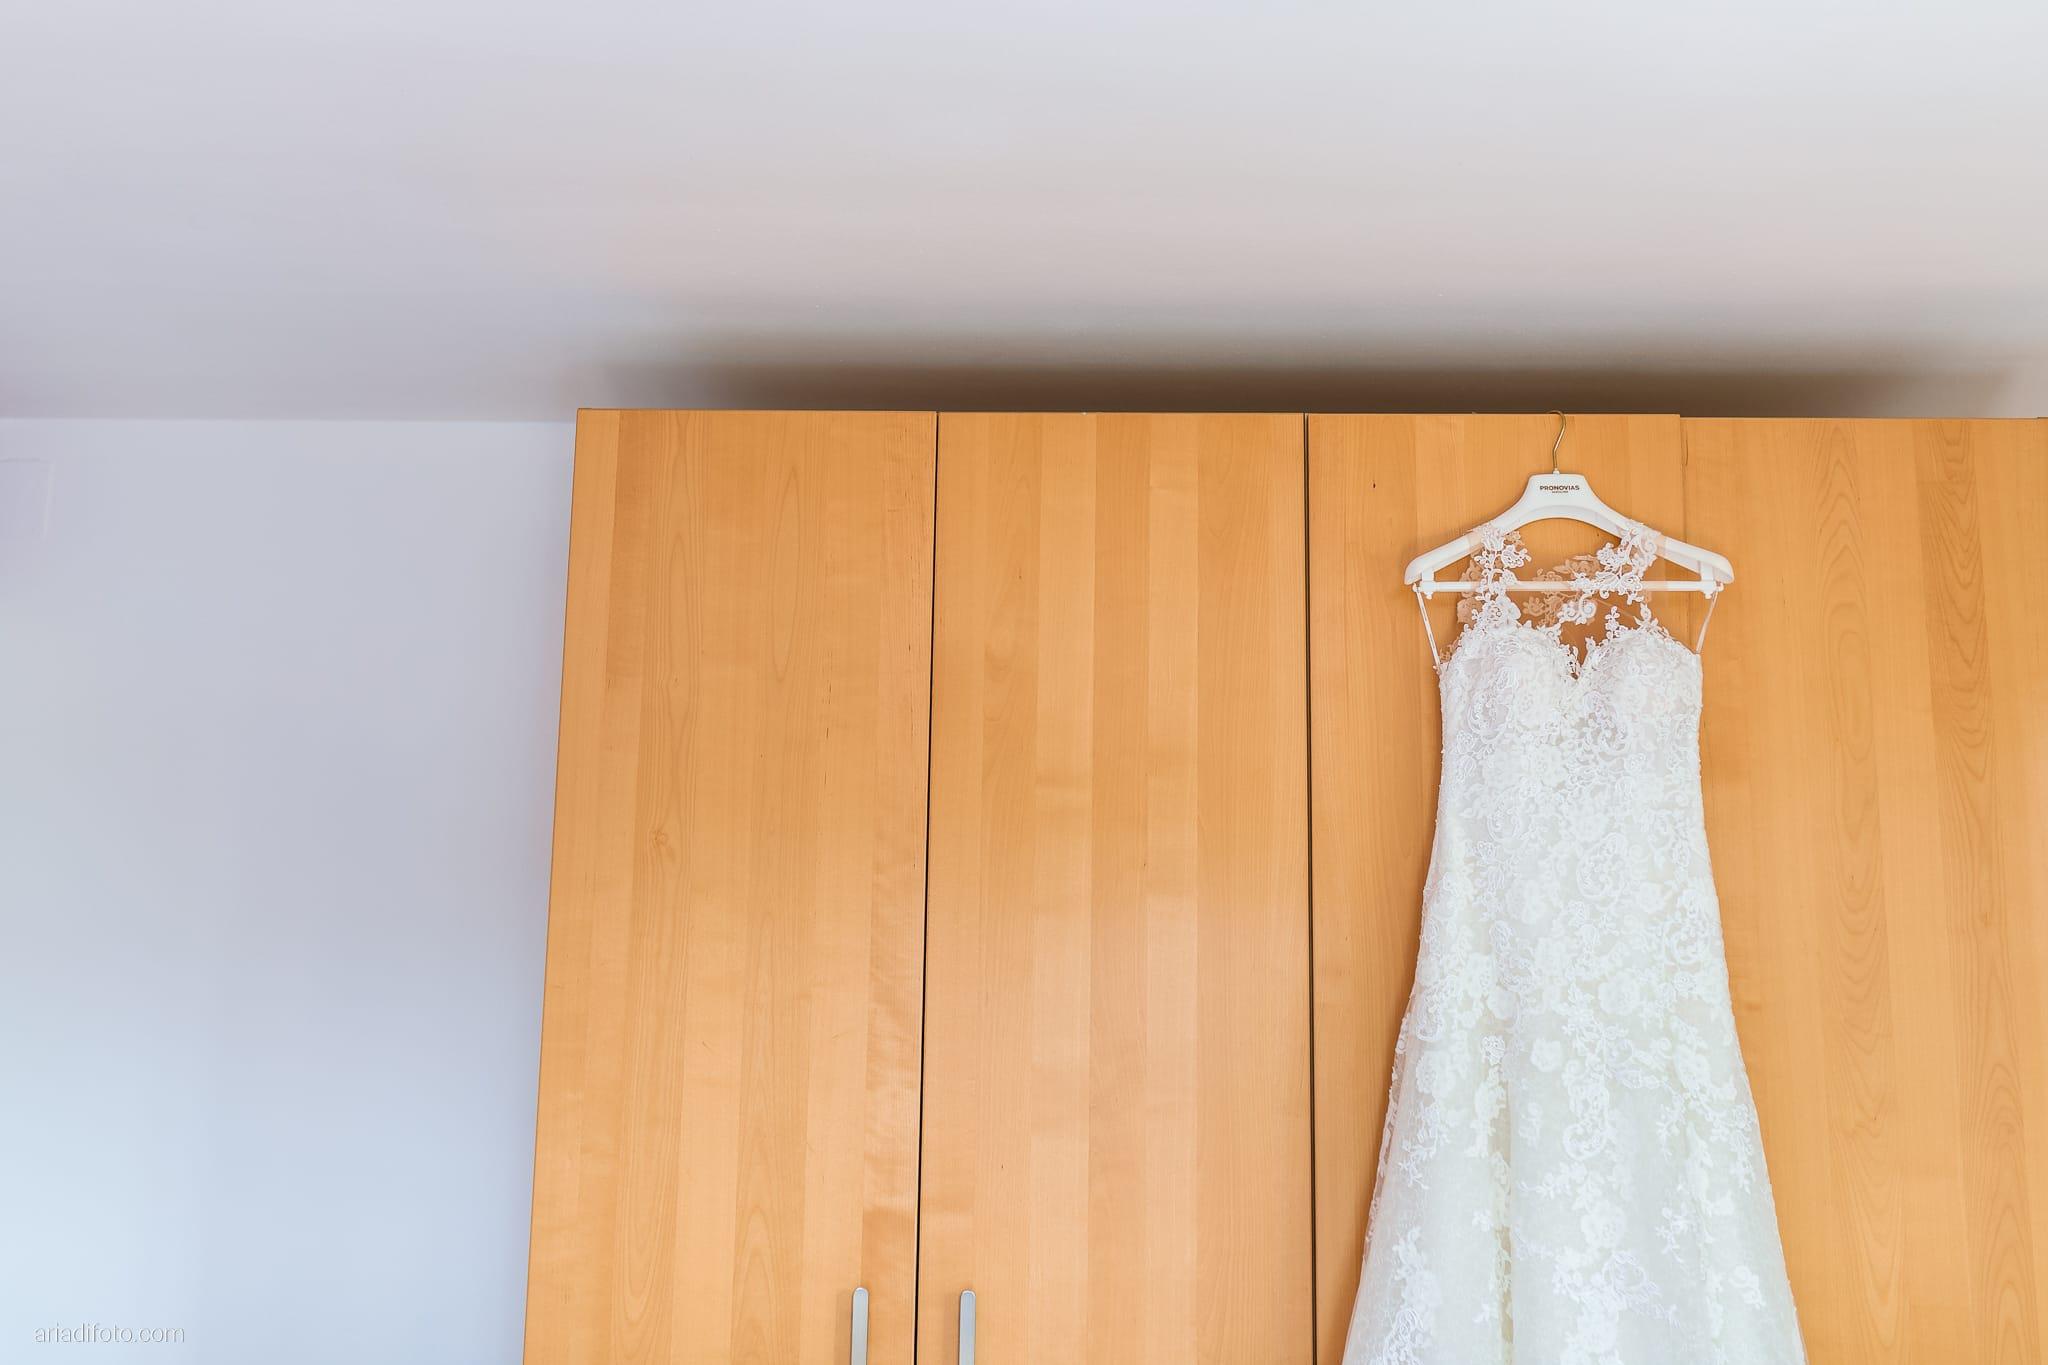 Valentina Marco Matrimonio Duomo Gorizia Castelvecchio Sagrado preparativi sposa dettagli abito